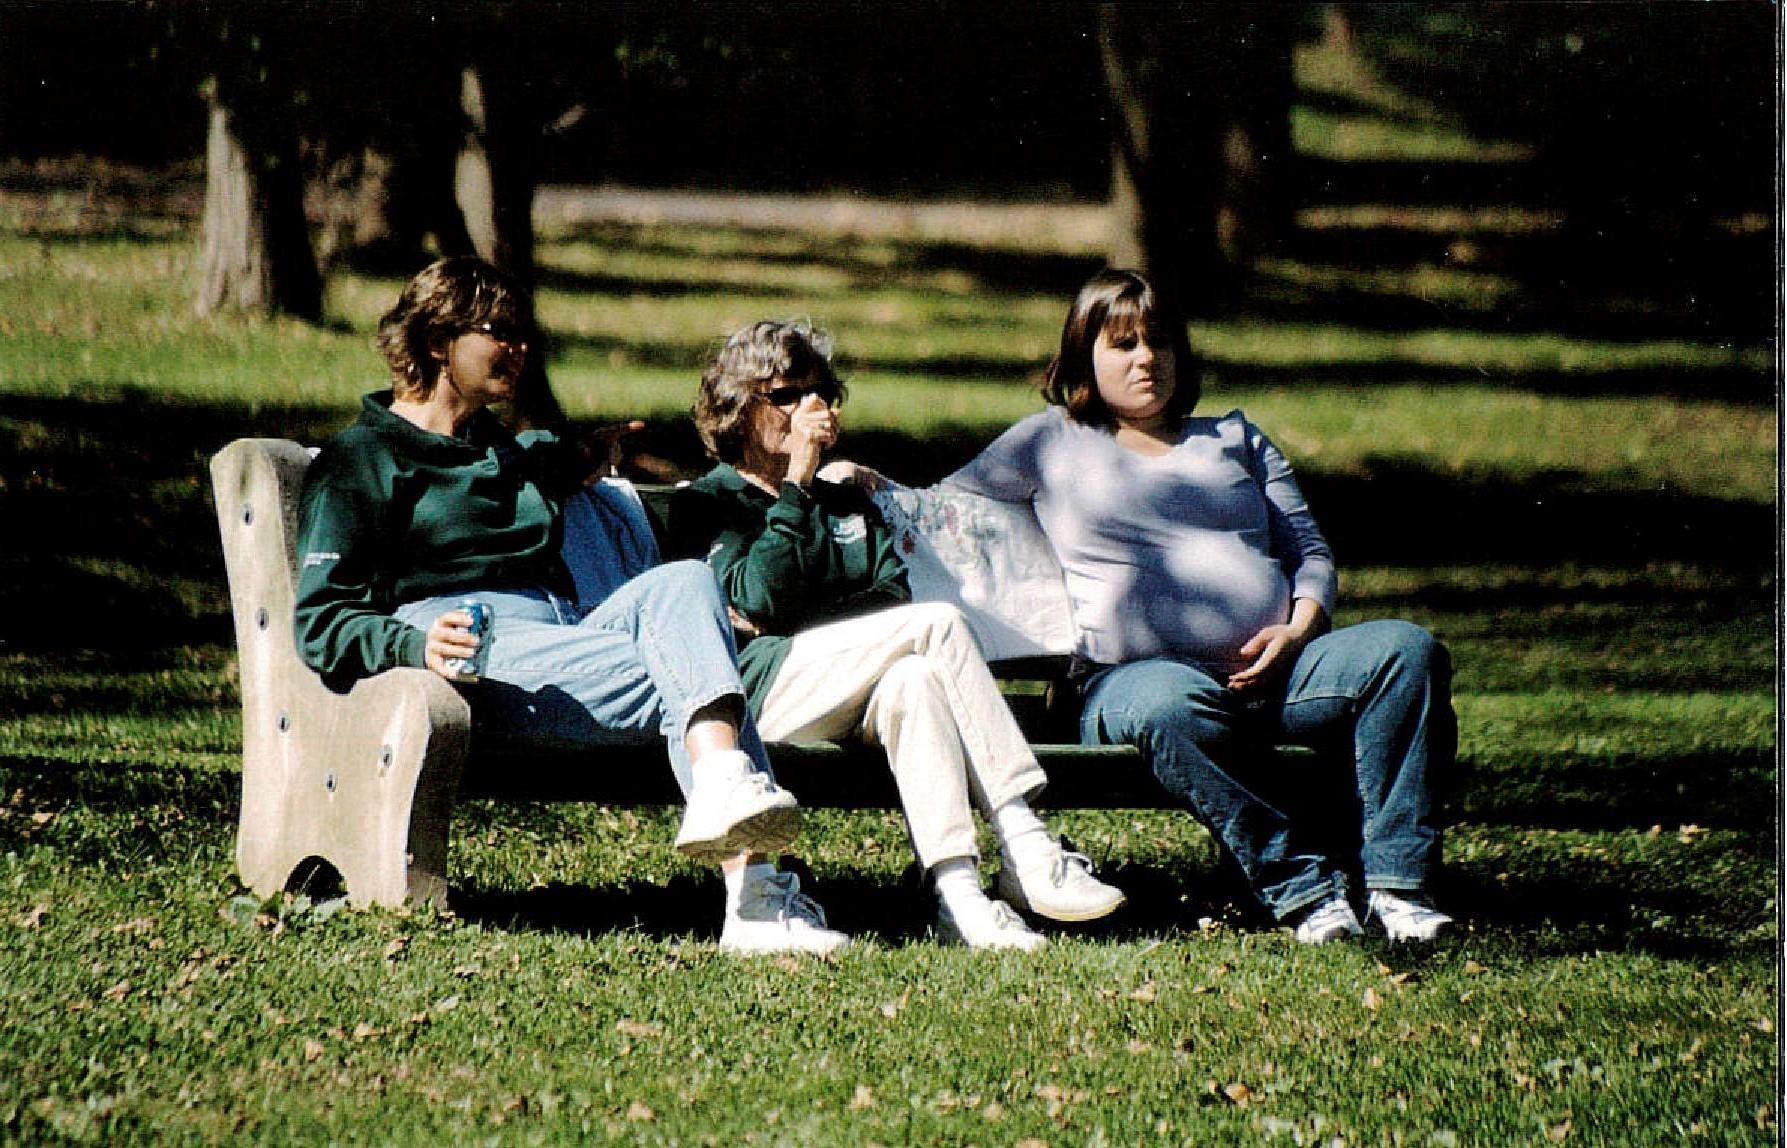 Karen, Ellie and Melanie | RC Homes Employees